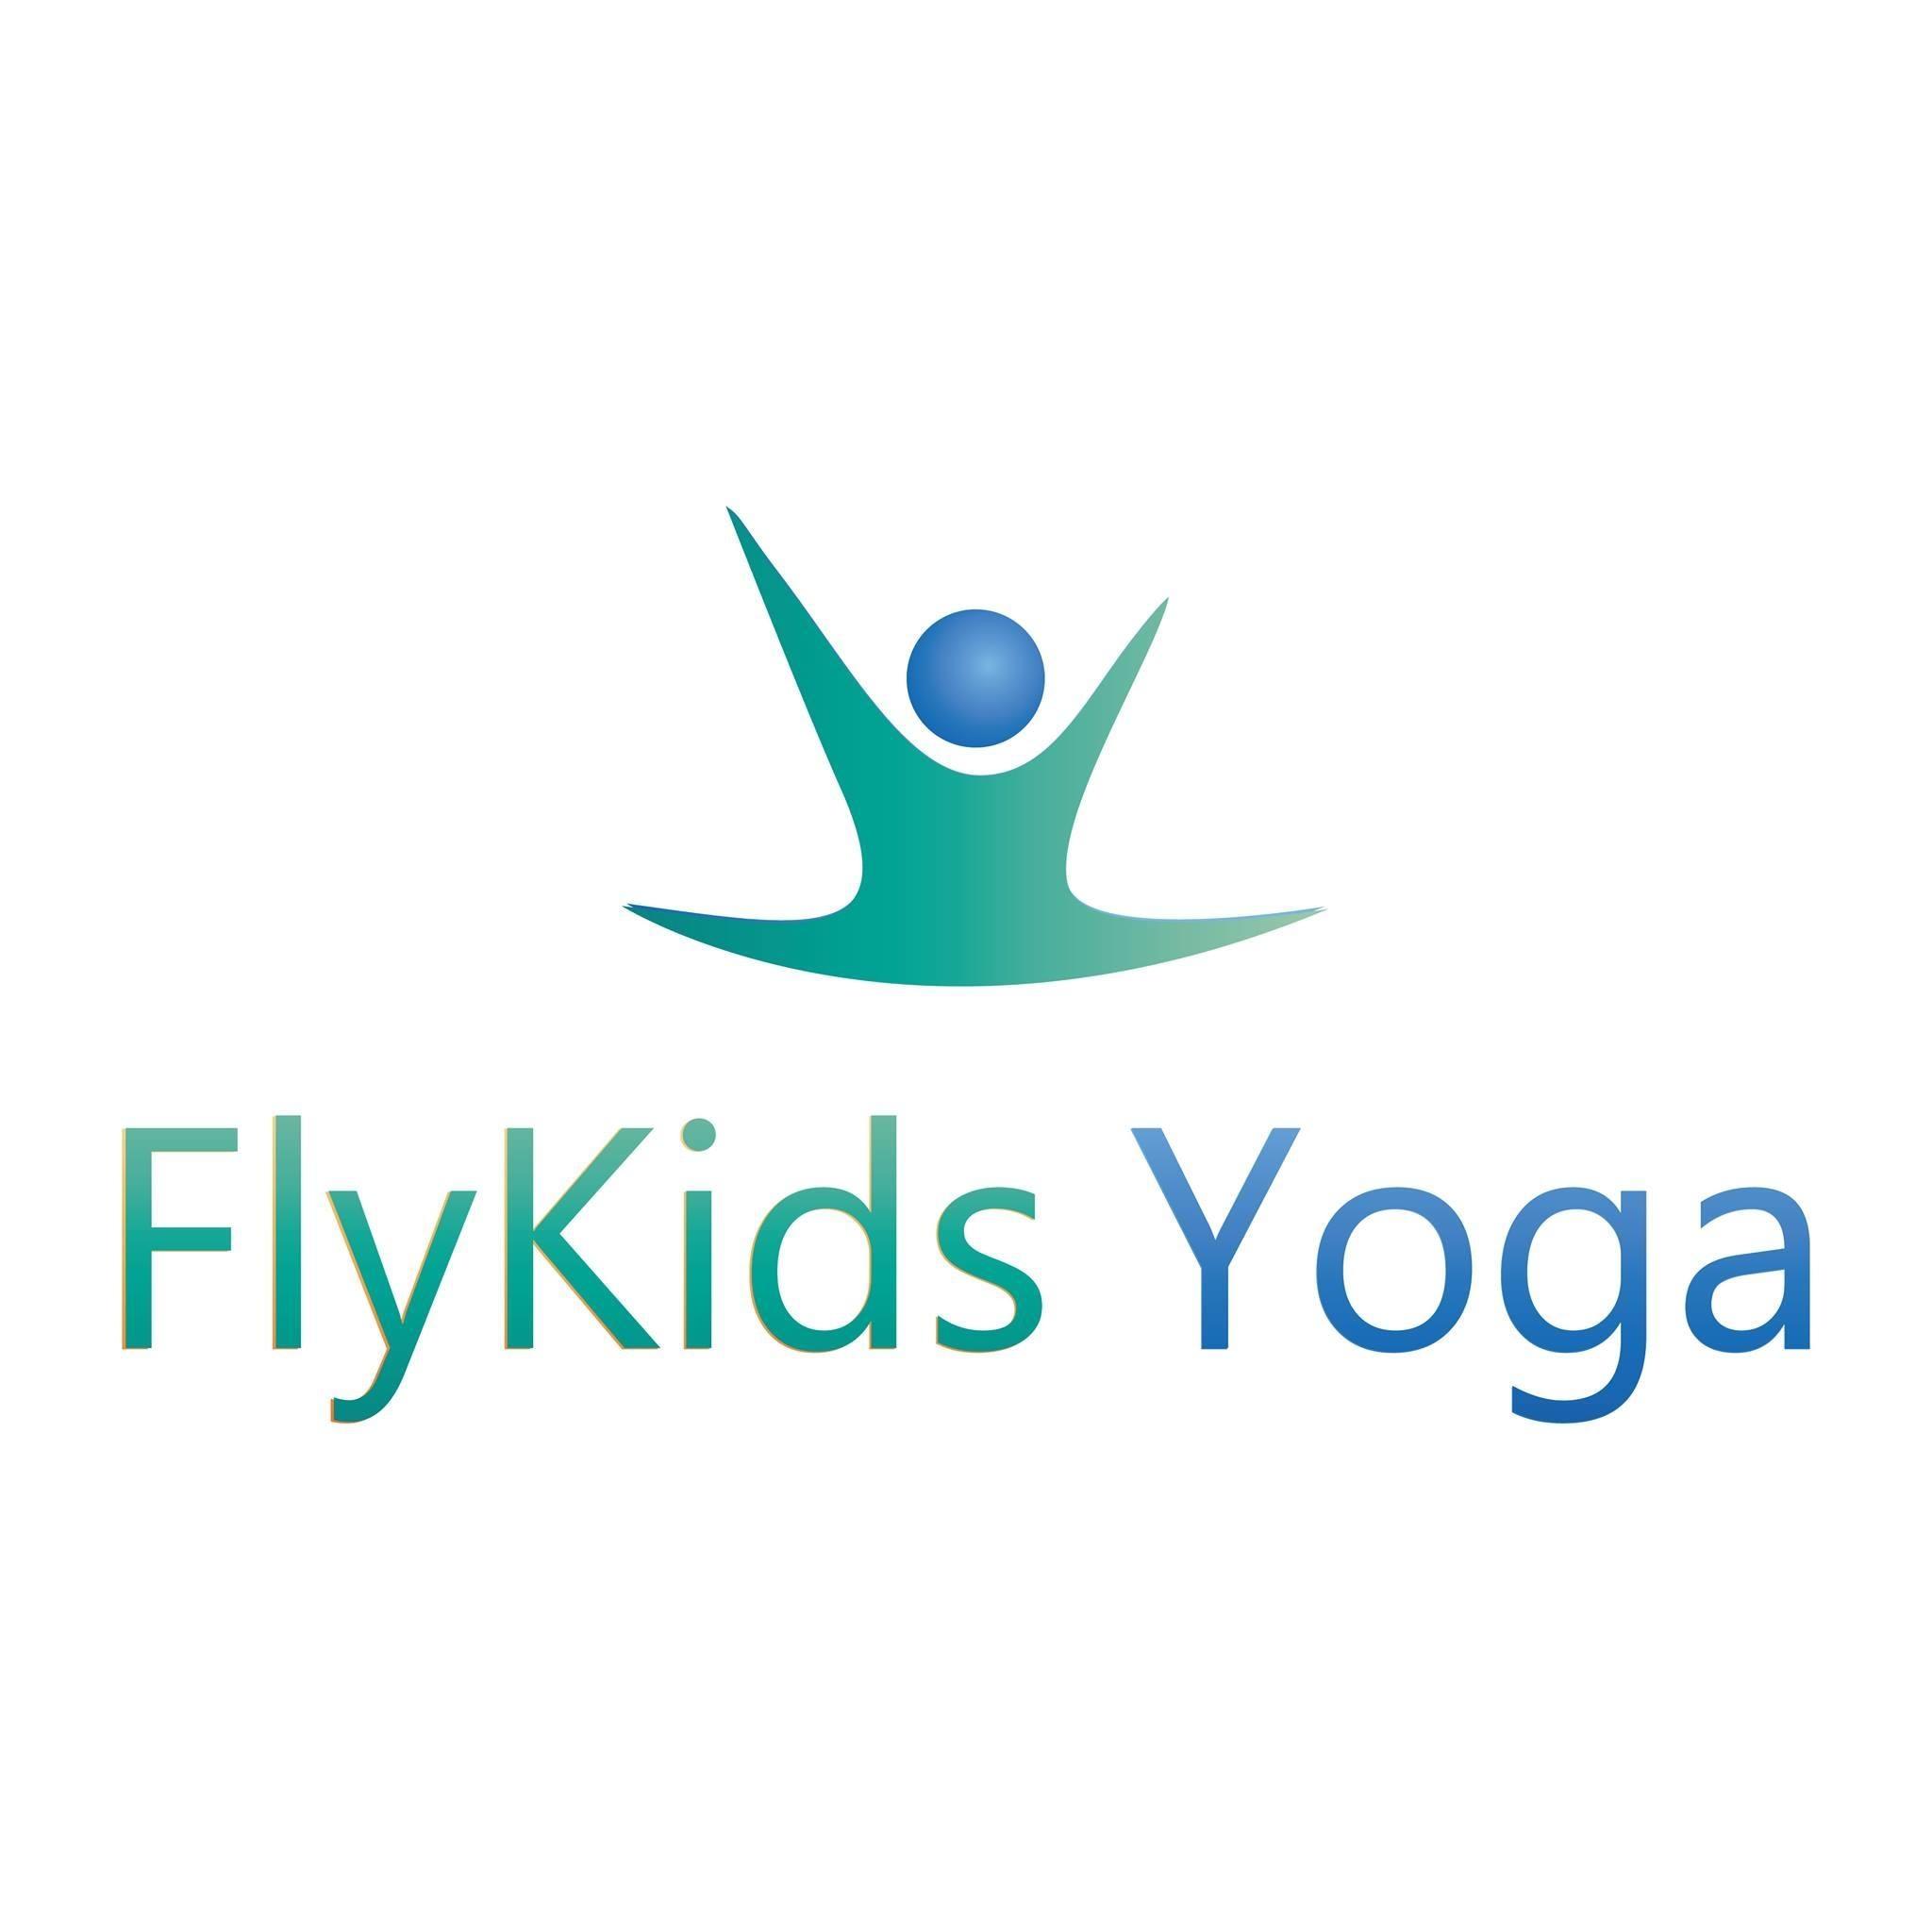 FlyKids Yoga